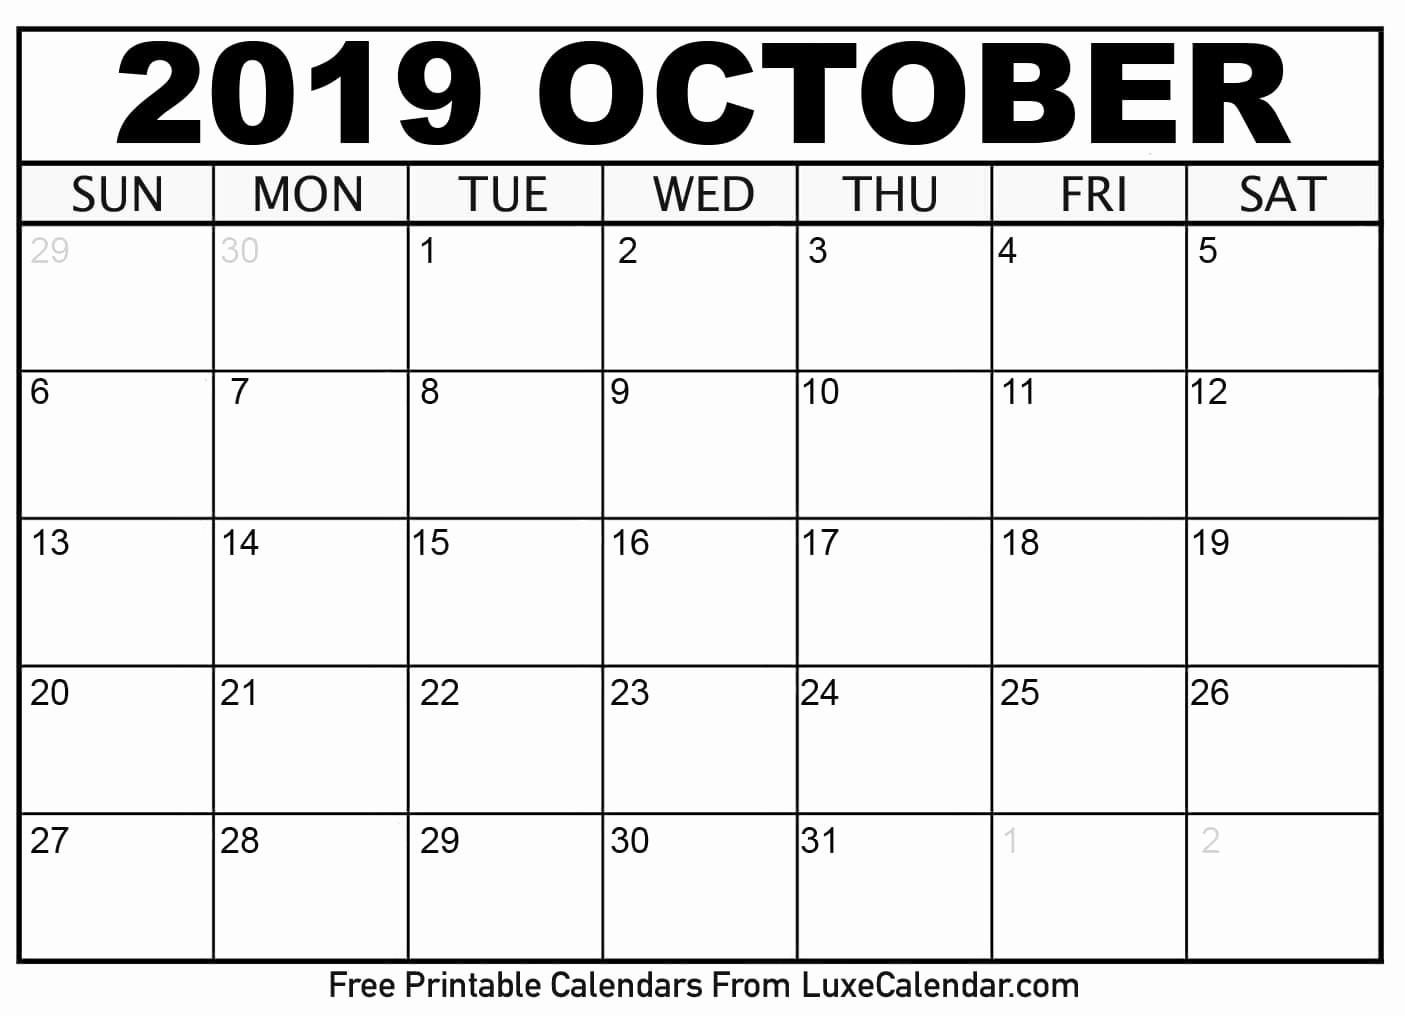 2019 Printable Calendar by Month Best Of Blank October 2019 Printable Calendar Luxe Calendar